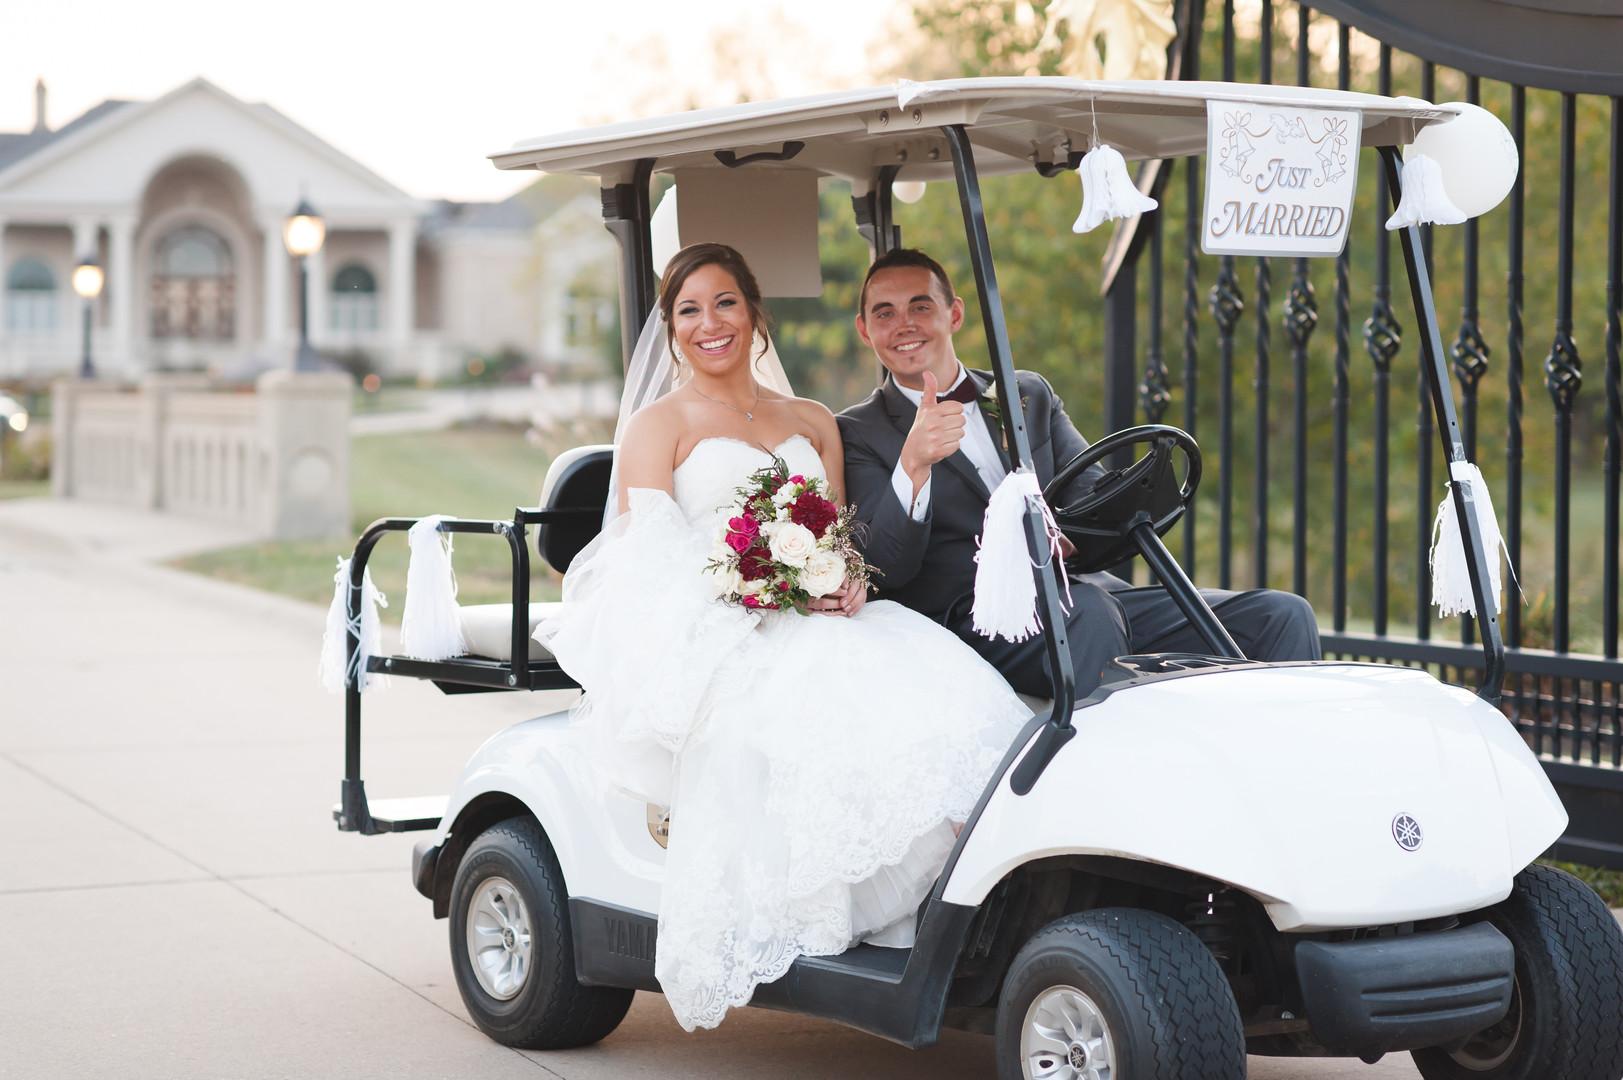 Bride and Groom Chicago Winery Wedding Elite Photo